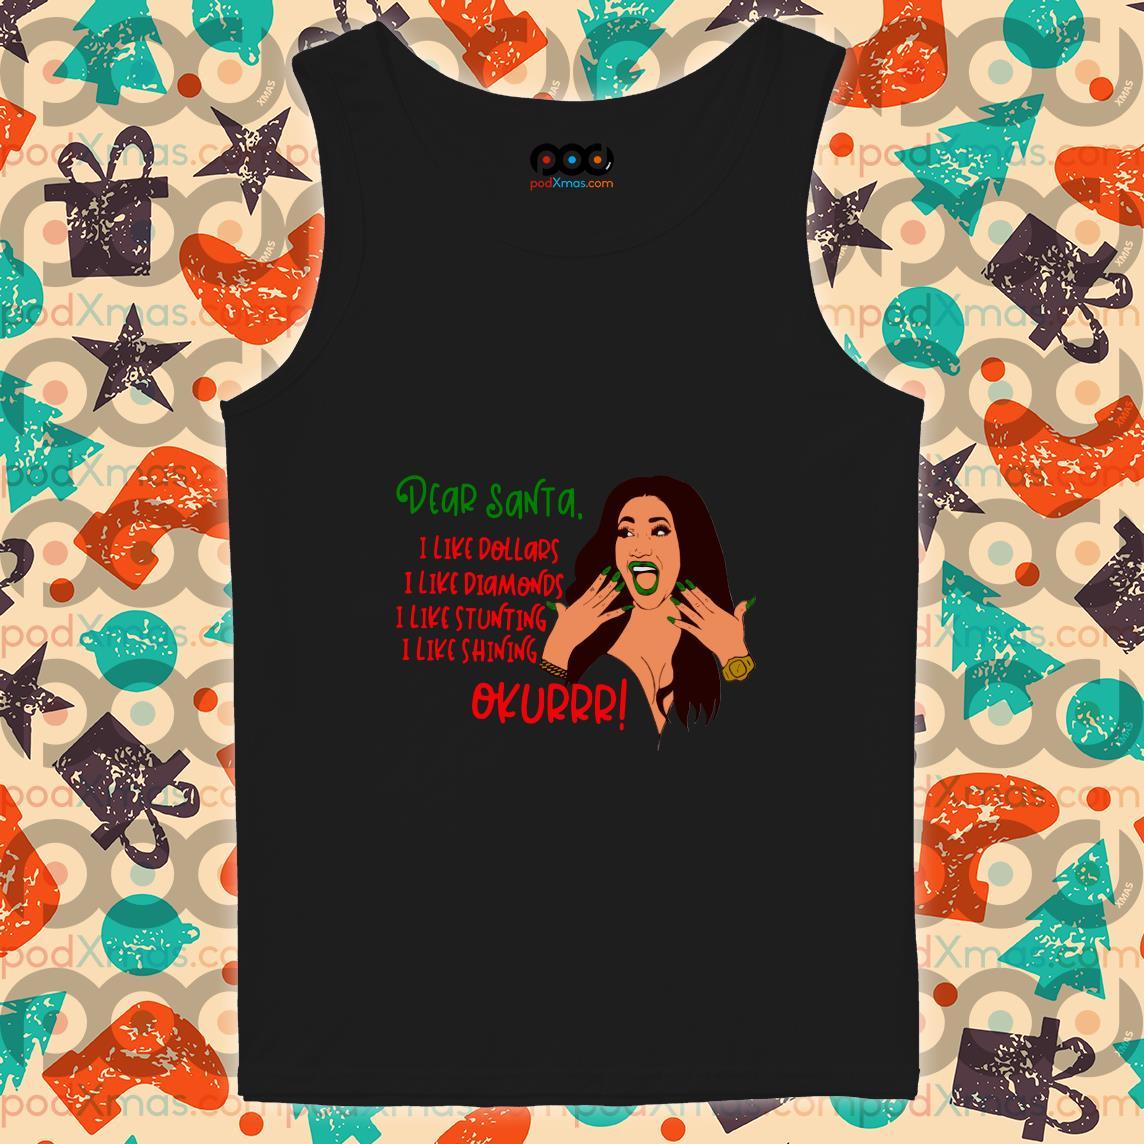 Dear Santa I like dollars I like diamonds Cardi B tank top